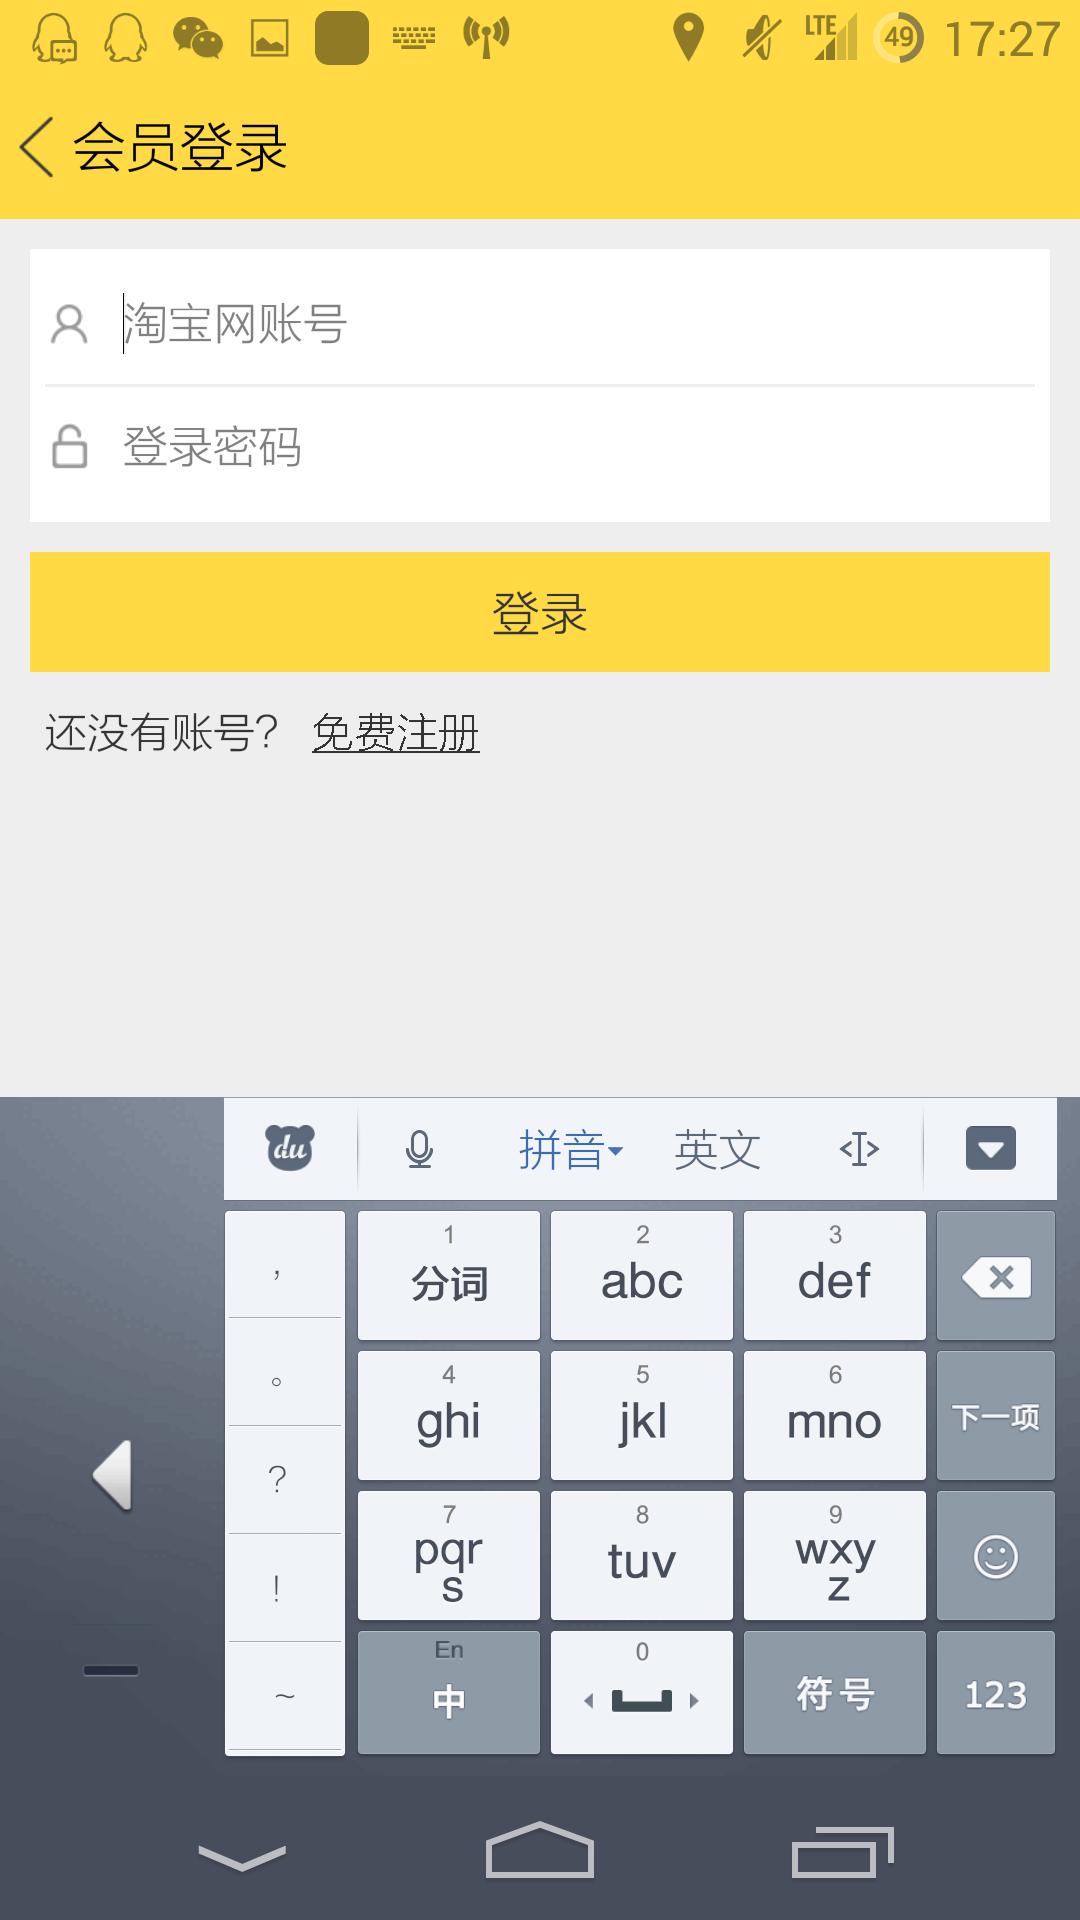 Screenshot_2013-09-17-17-27-05.png